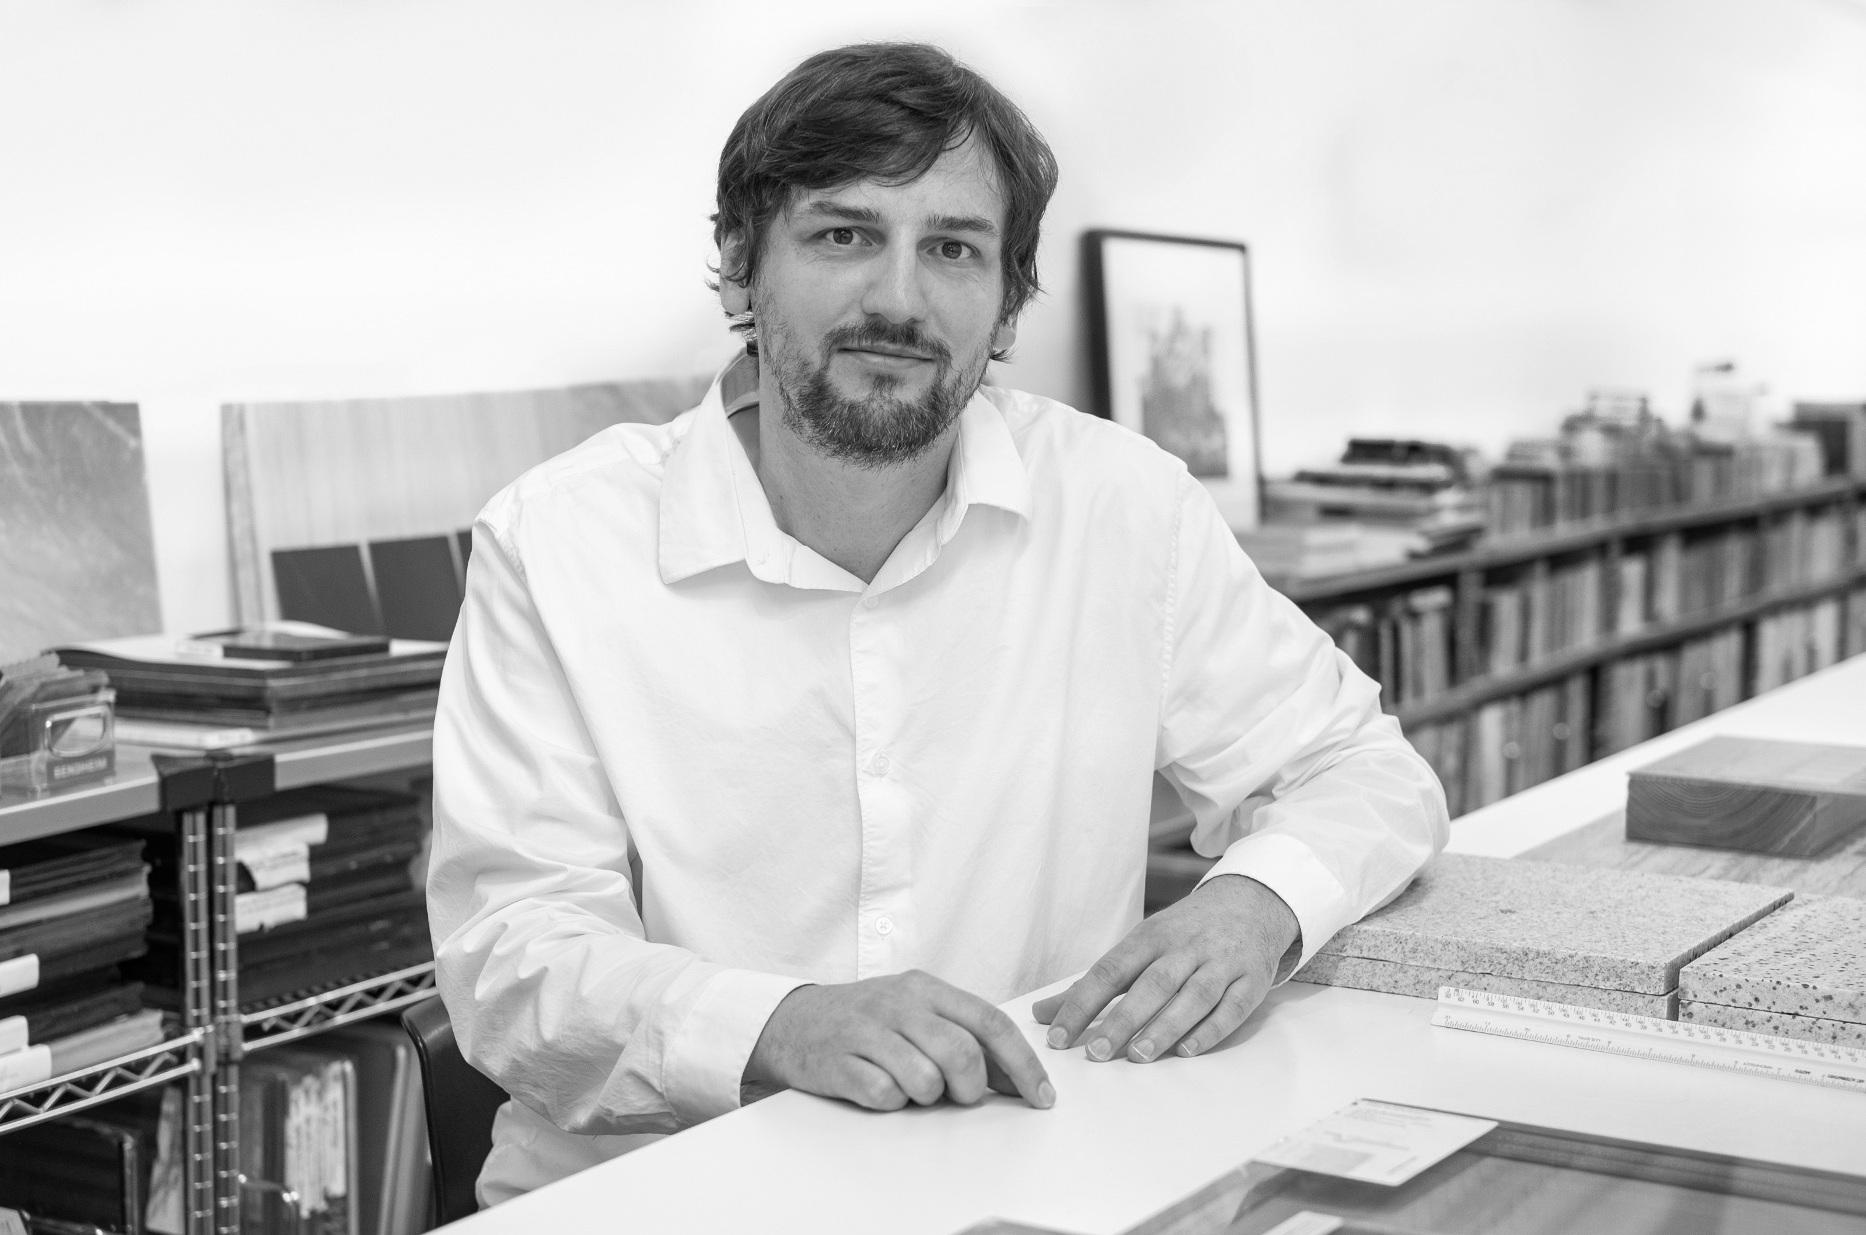 Bertram Doerfler, Director